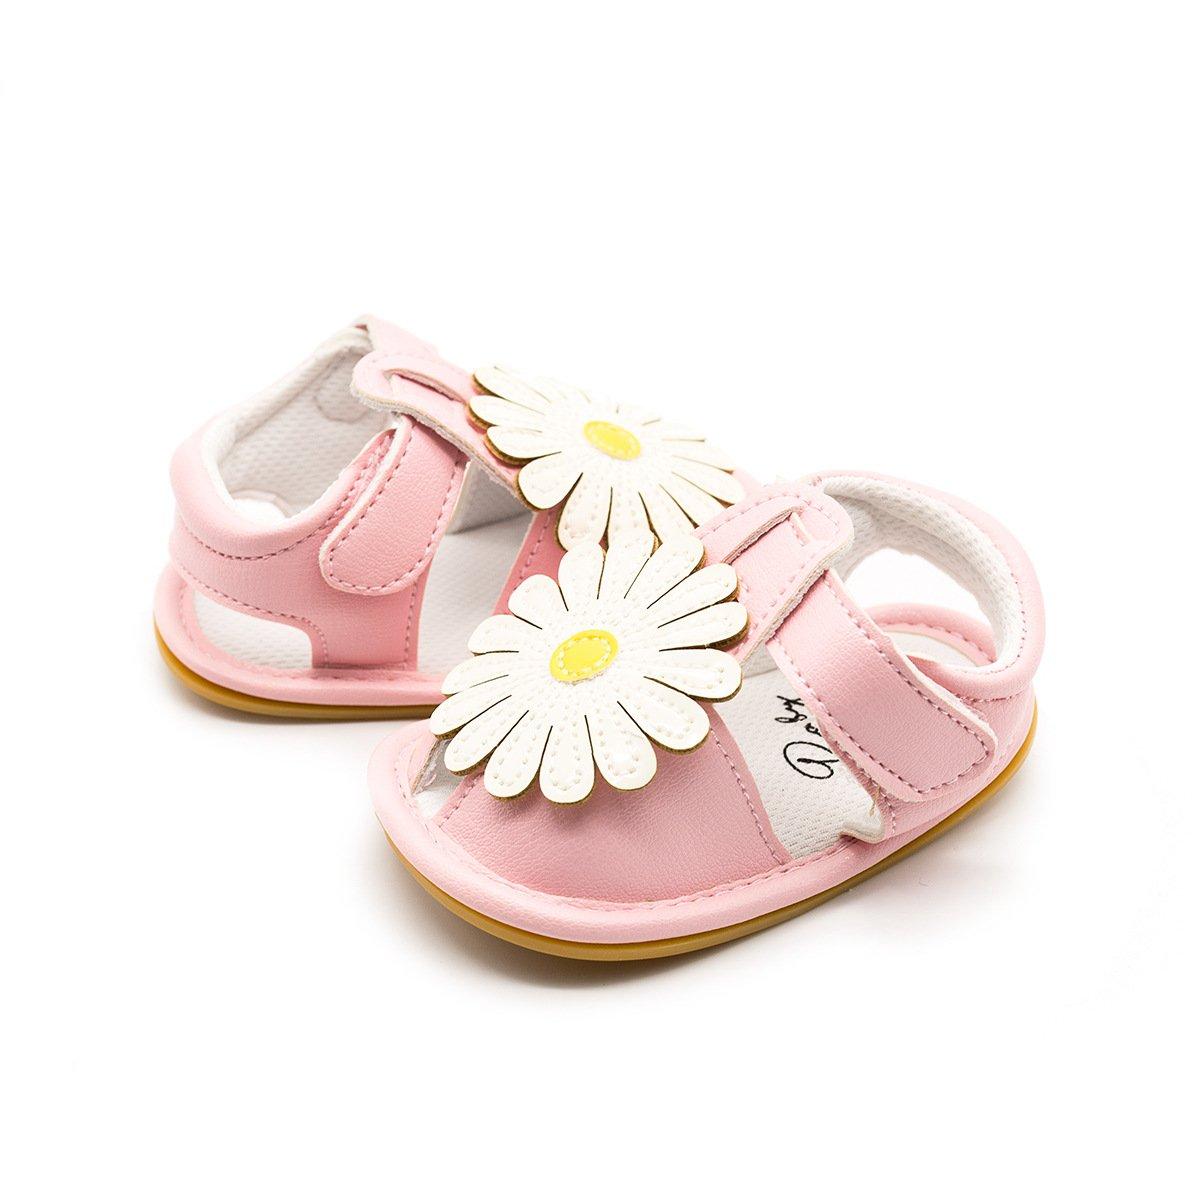 HONEY$HOMEY Baby Girls Sneaker Shoes Ultra-Soft Sunflower Decor Rubber/Sole Infant Crib Sandals